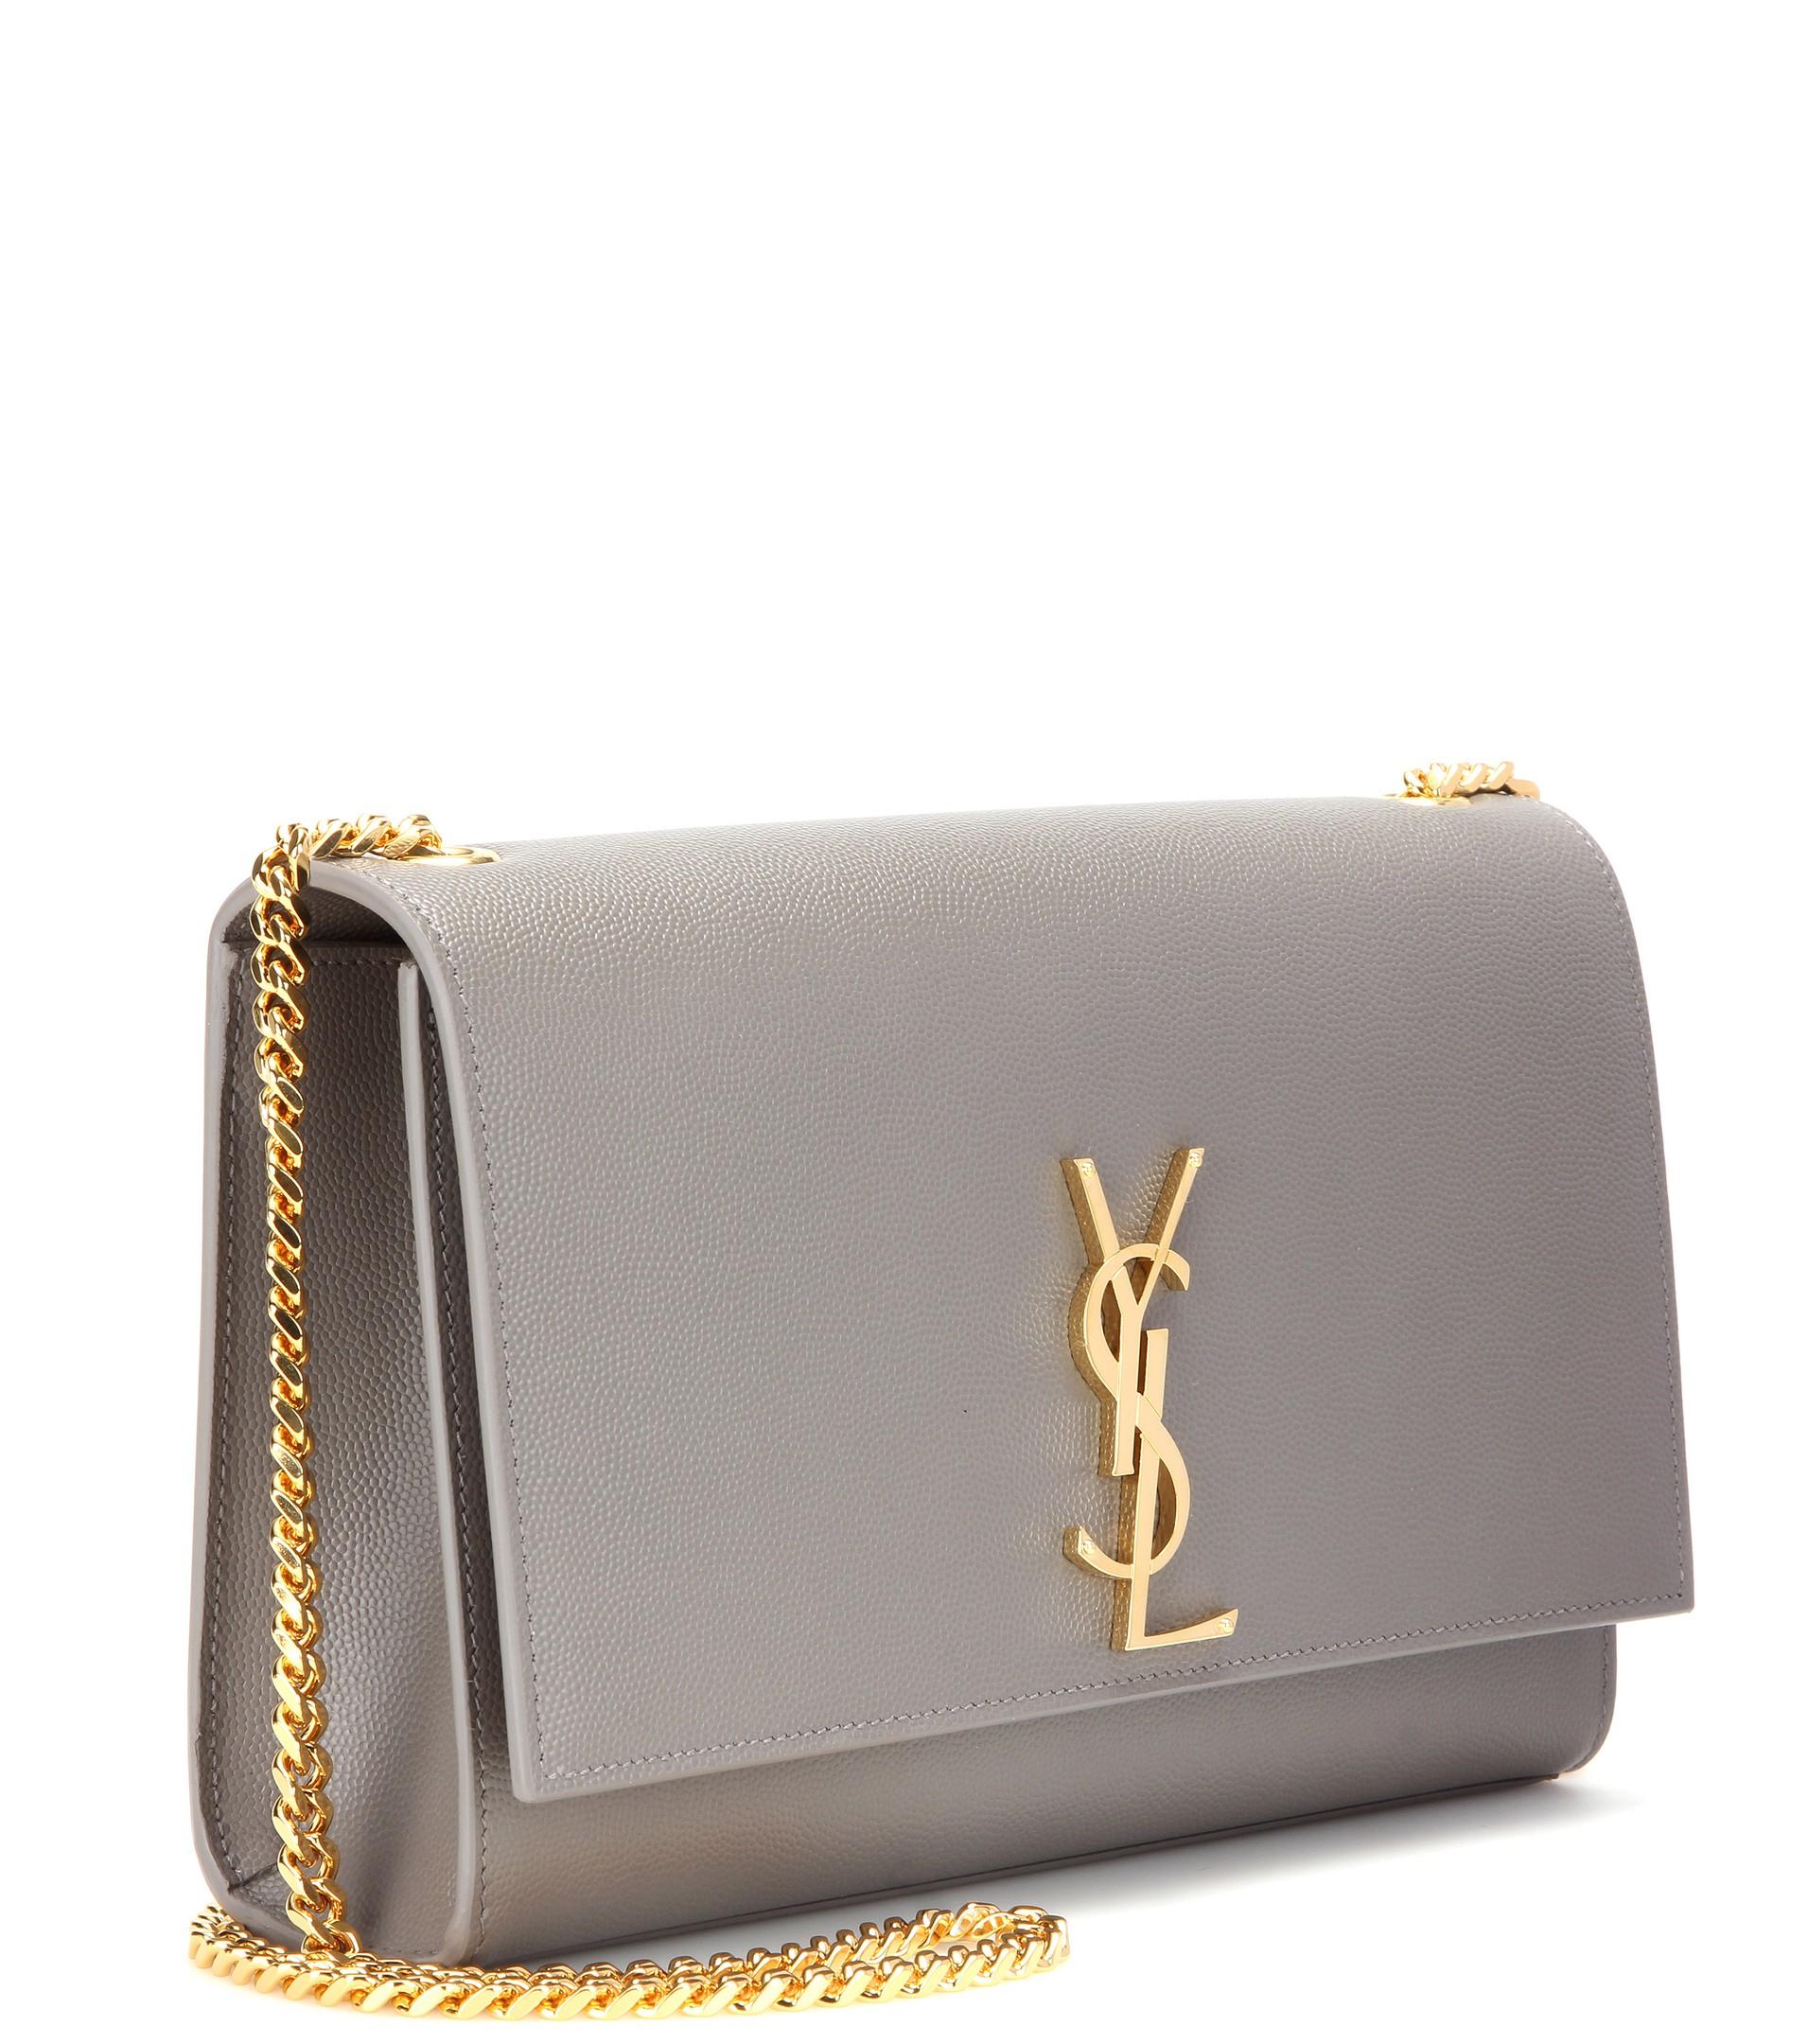 8608f5d12950 Lyst - Saint Laurent Classic Monogram Leather Shoulder Bag in Gray